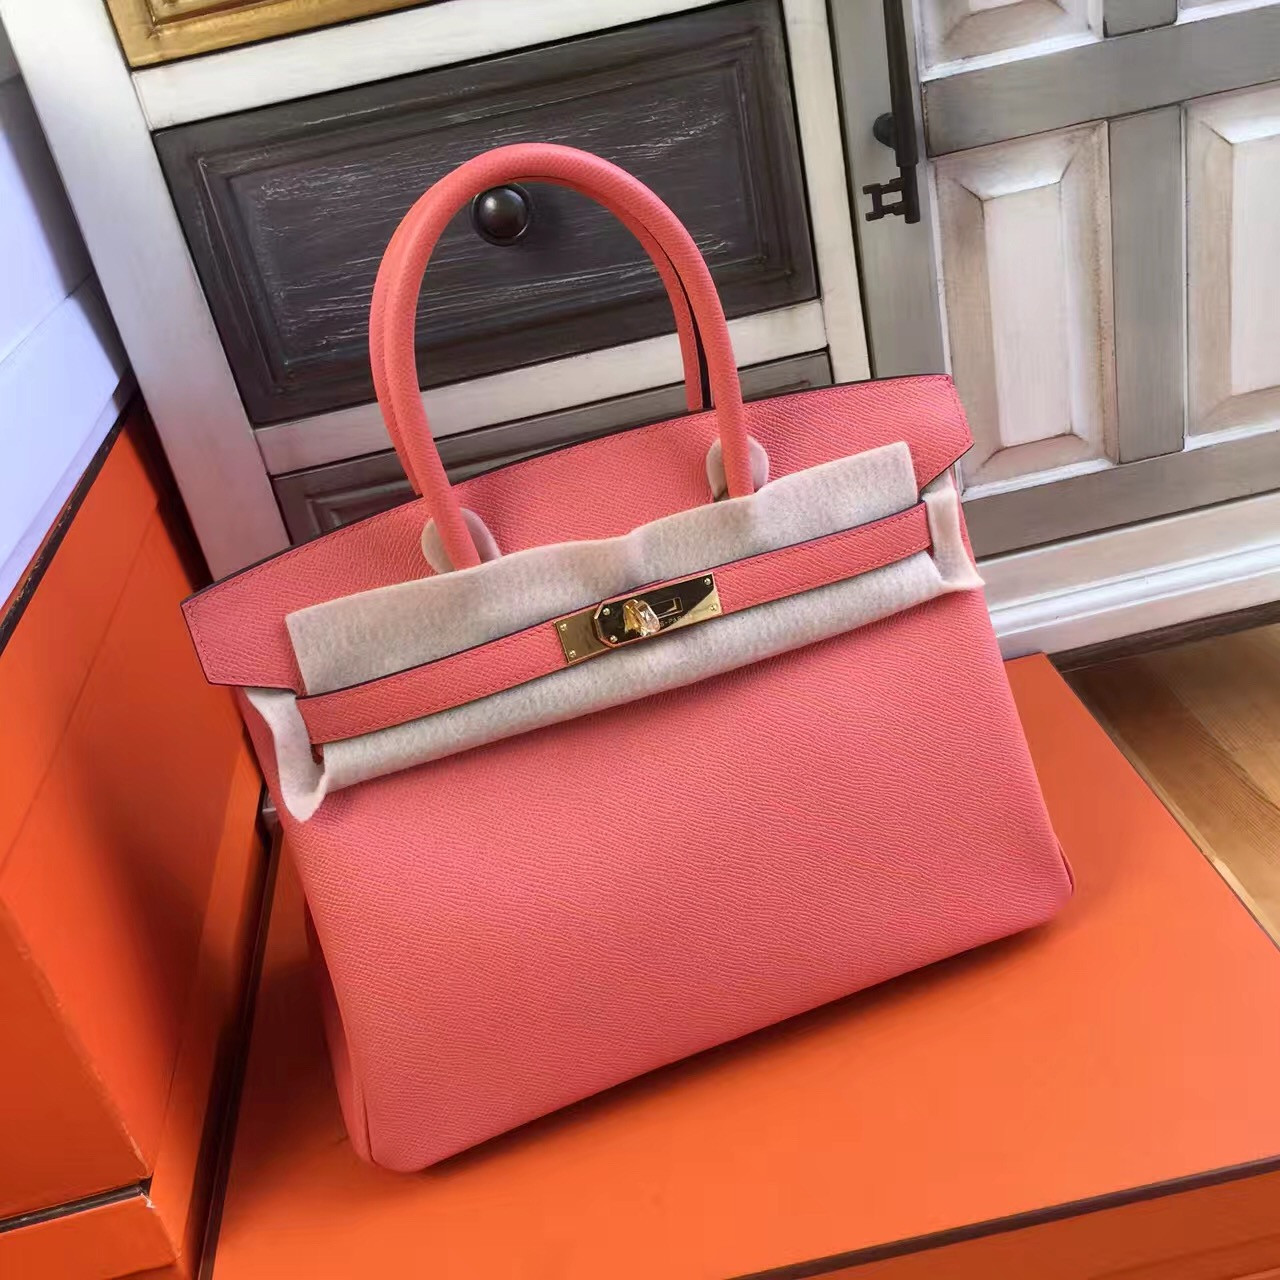 6982cd42f3 Hermès I5 Flamingo Birkin 30 cm Togo Leather Gold Hardware - Bella ...